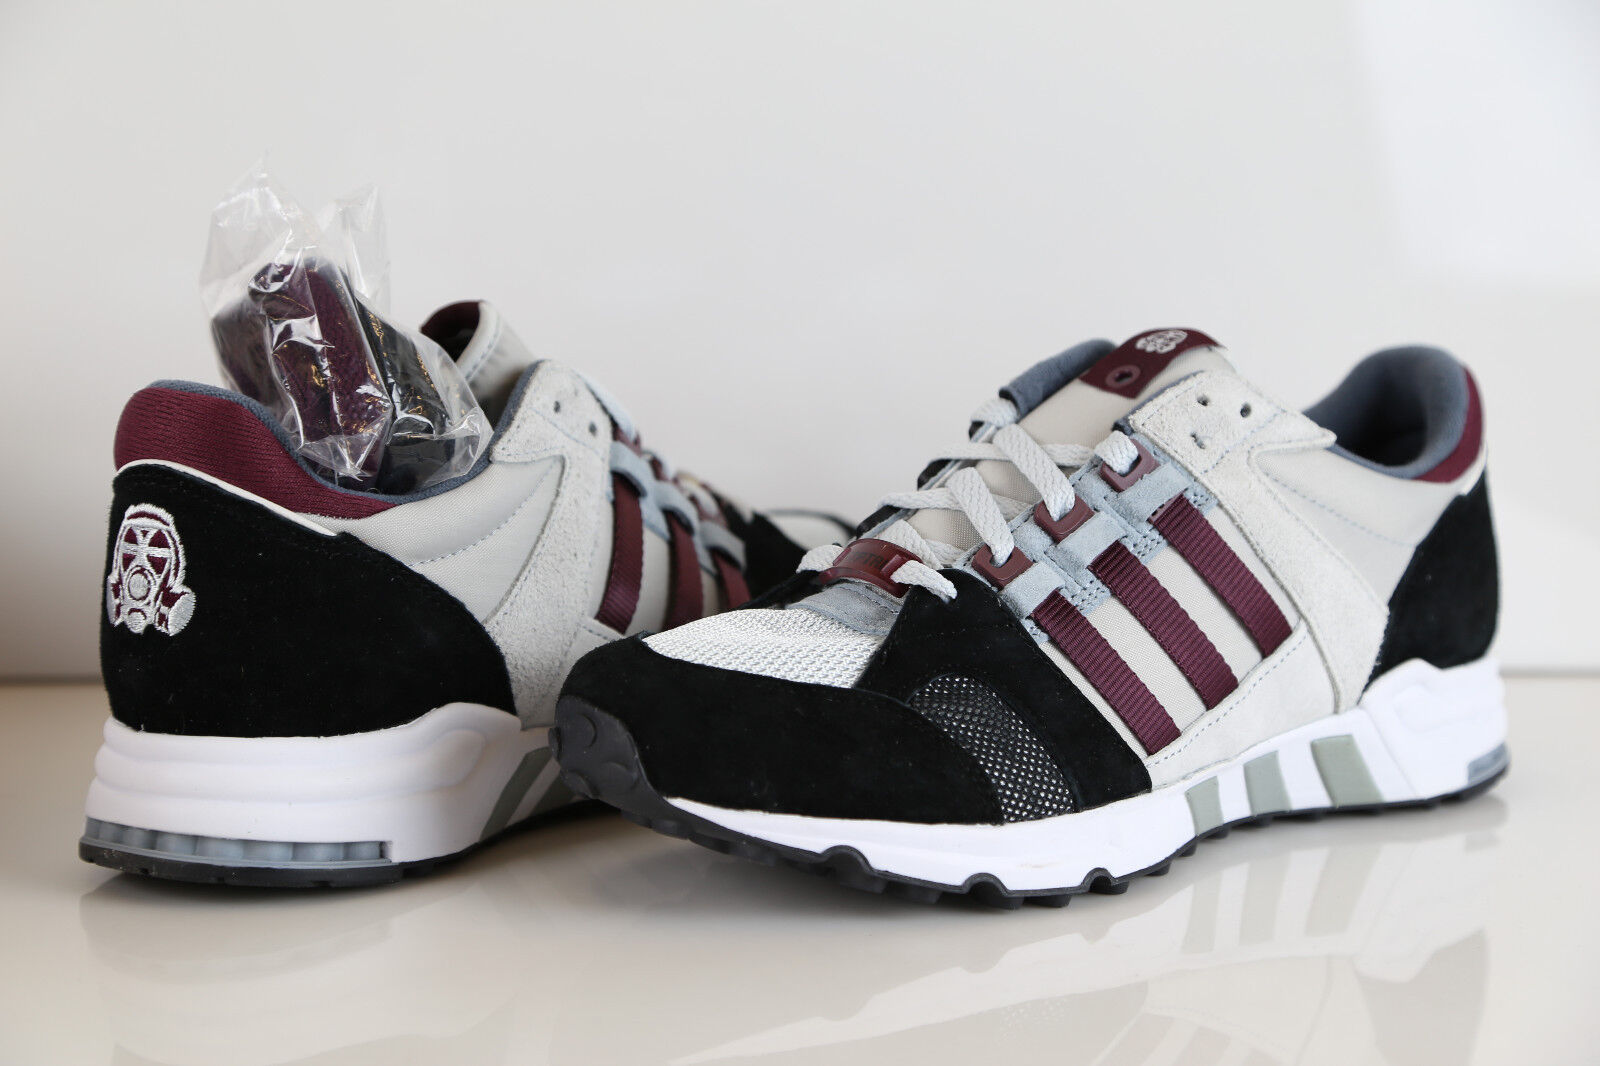 Adidas FootPatrol Consortium EQT Equipment Running Cushion 93 S80568 8-rf 1